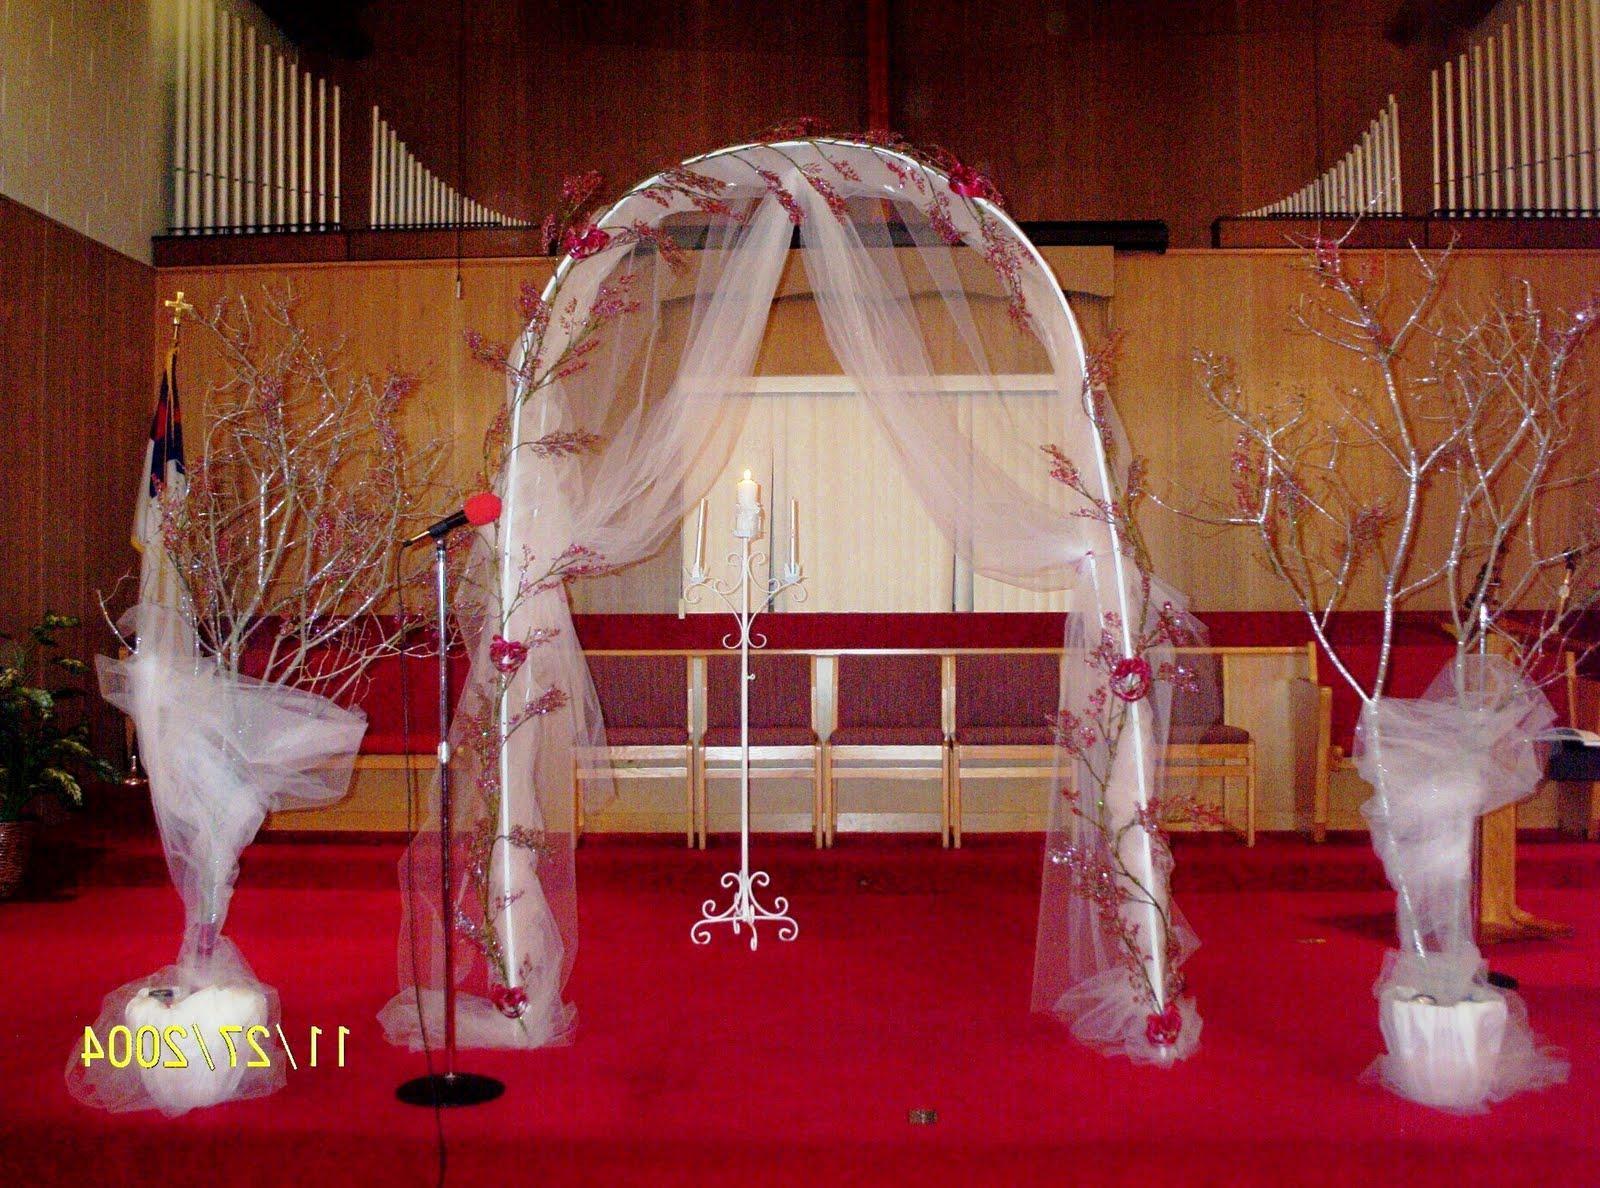 Decorating the Church